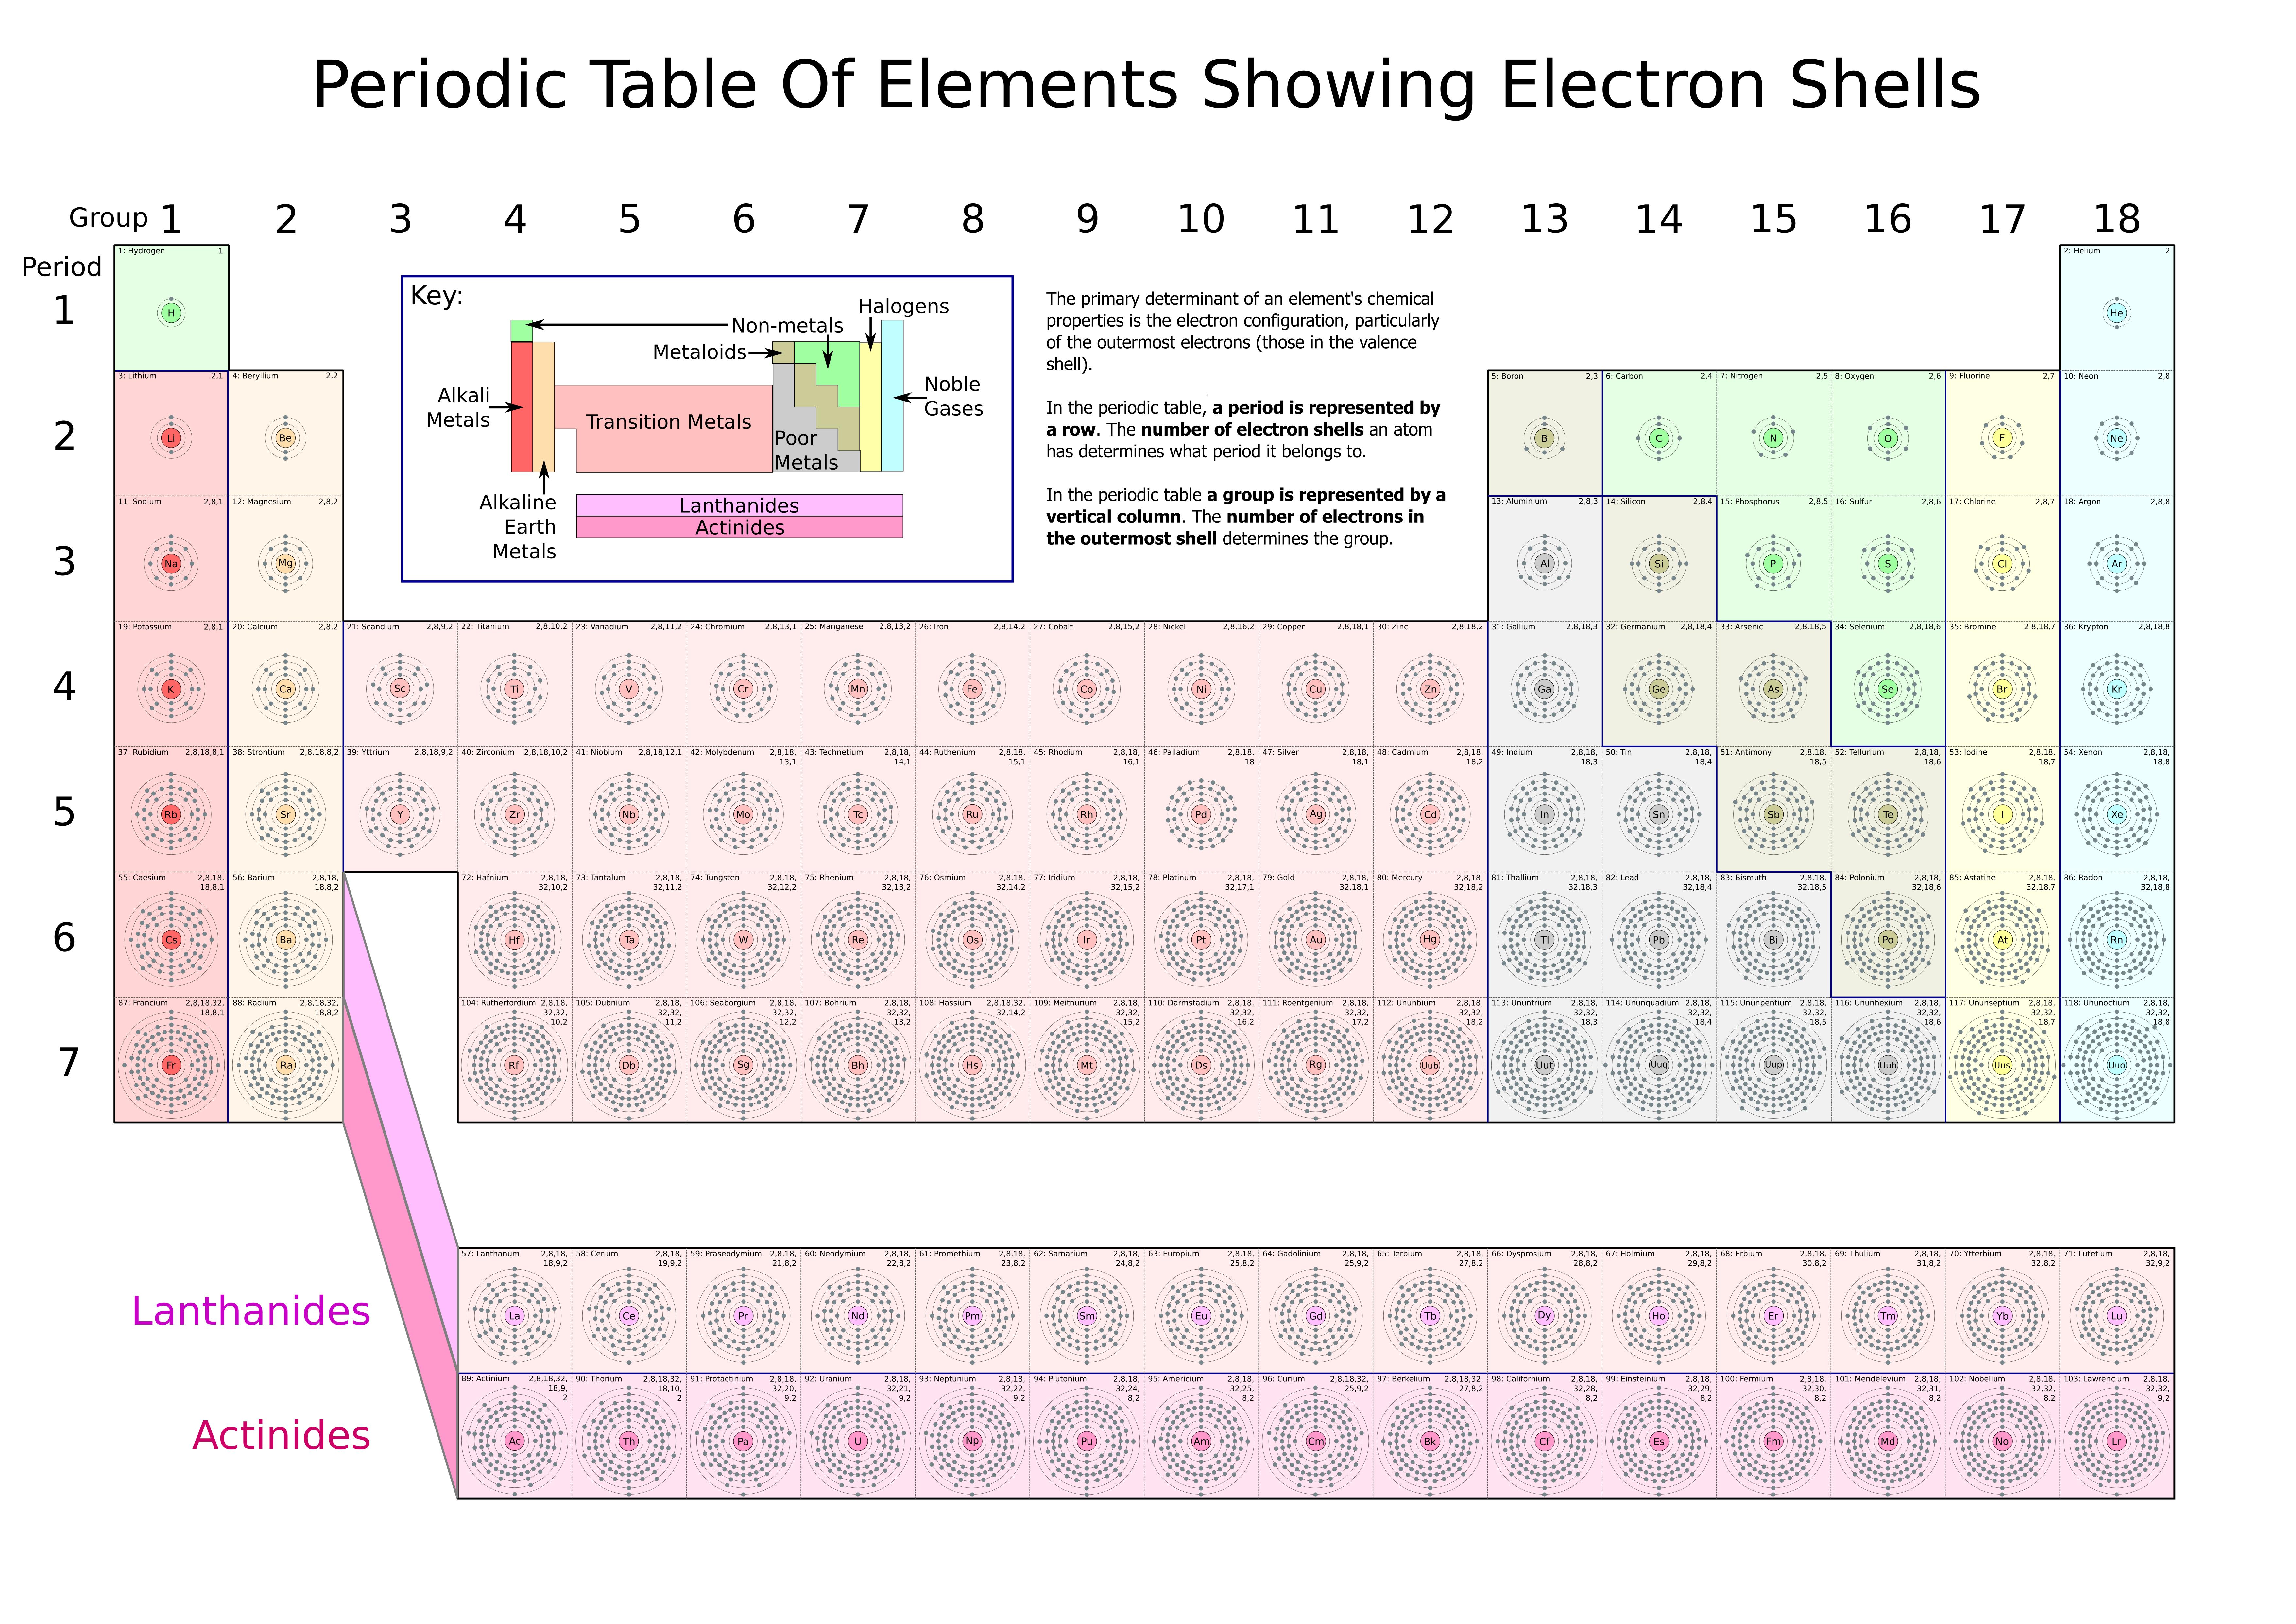 Pin by organic lifestyle today on periodic table of elements periodic table of elements showing electron shells electron shell wikipedia the free encyclopedia urtaz Choice Image